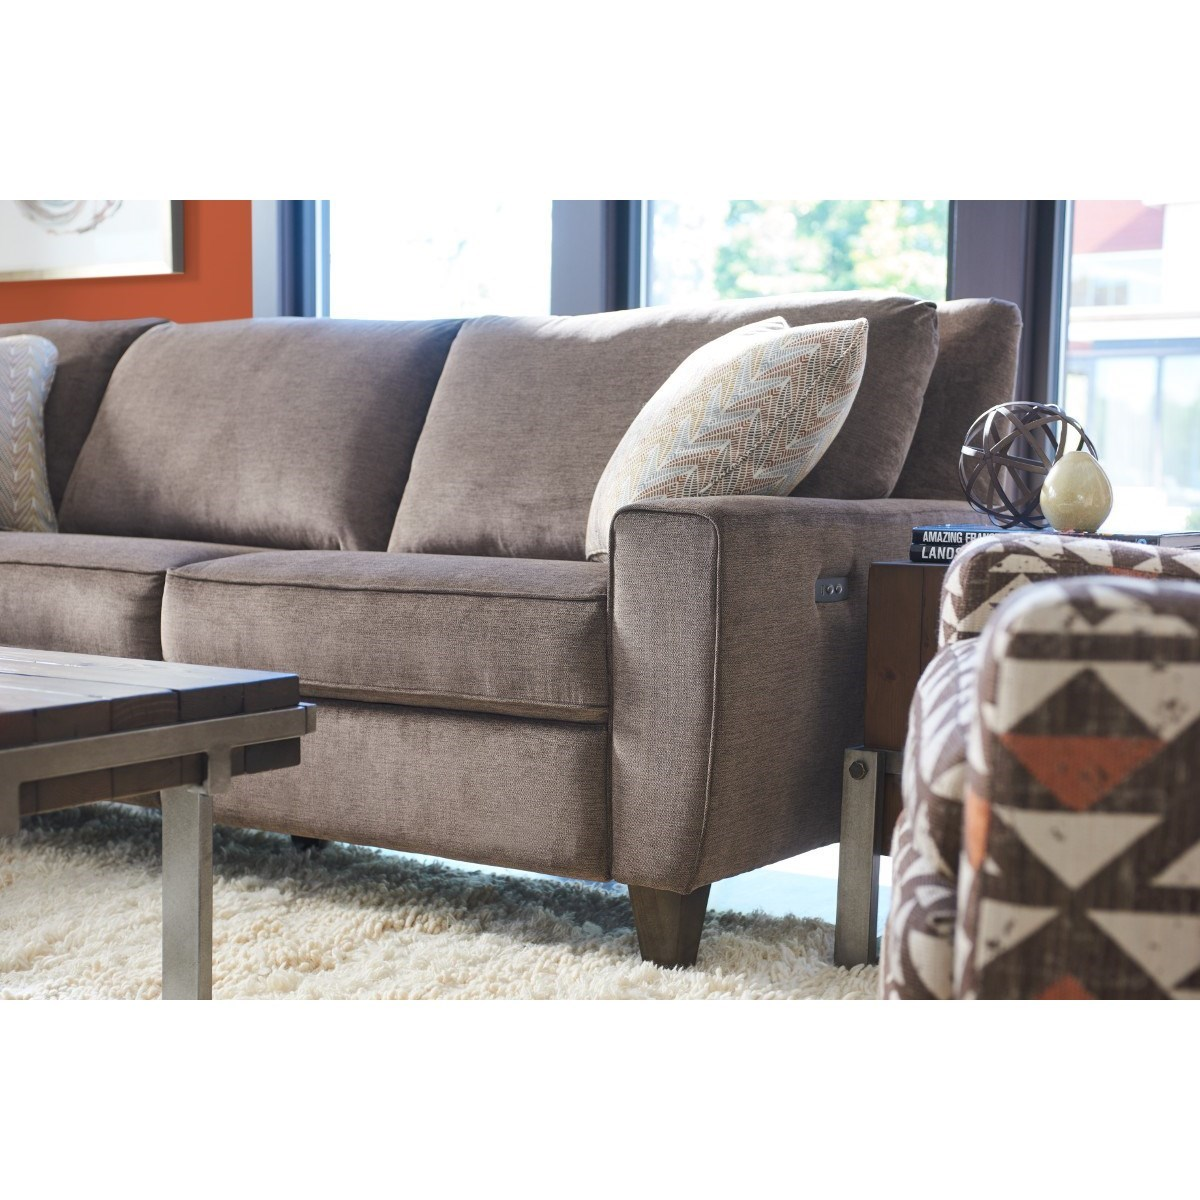 4 piece recliner sectional sofa black room ideas la z boy edie four power reclining